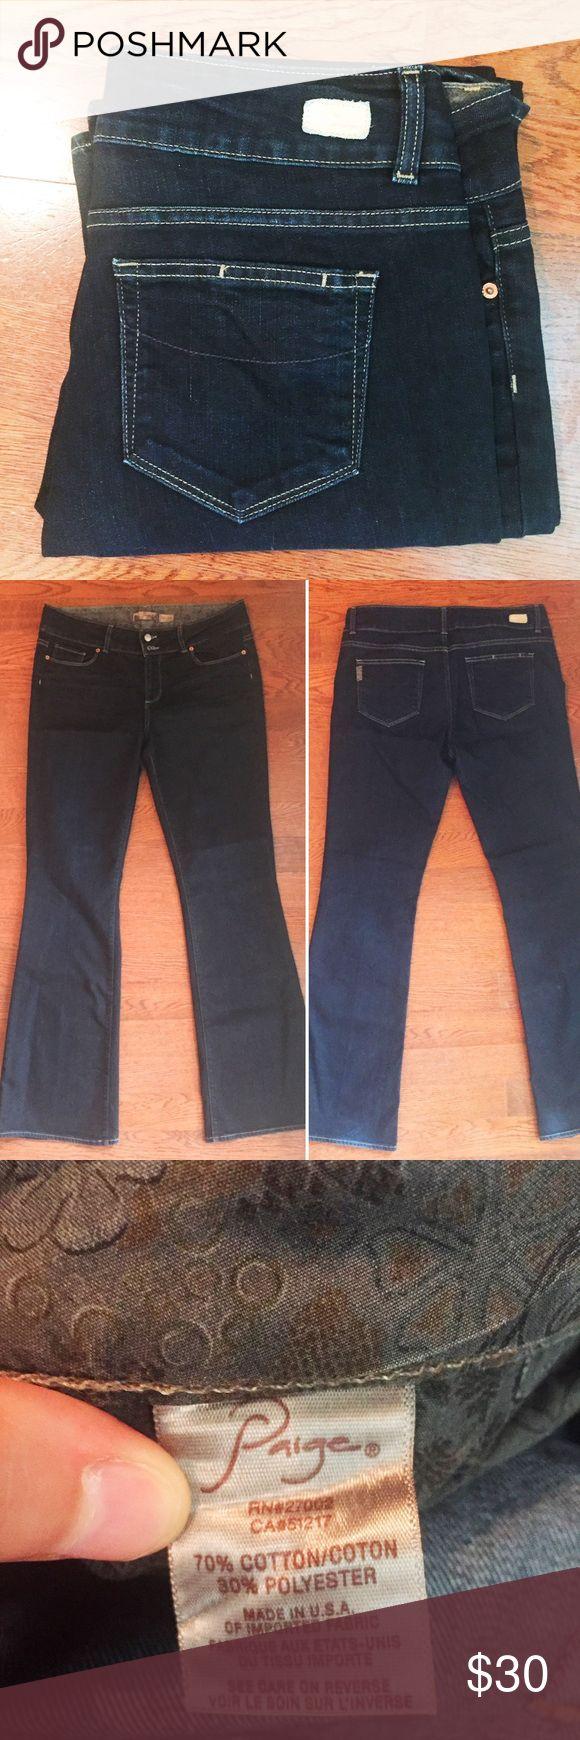 Paige Premium Denim Hidden Hills Dark Flare Jeans Paige Premium Denim Hidden Hills Dark Denim Flare Size 32 Jeans  Waist x Inseam 34x34 Preowned excellent condition Paige Jeans Jeans Flare & Wide Leg